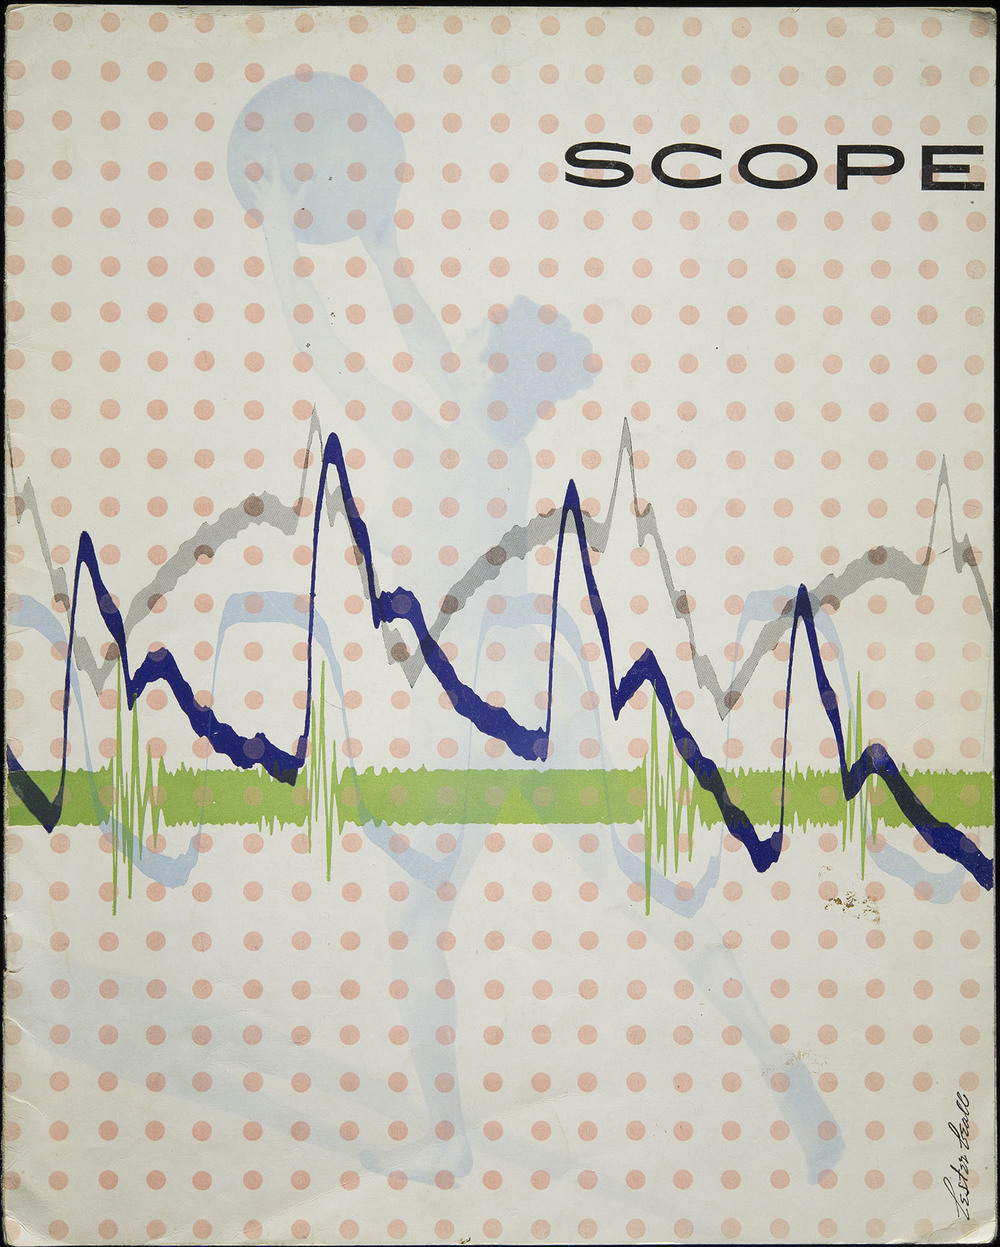 Lester Beall, Scope  magazine, The Upjohn Company, Kalamazoo, 1948, 23 x 28.8 cm